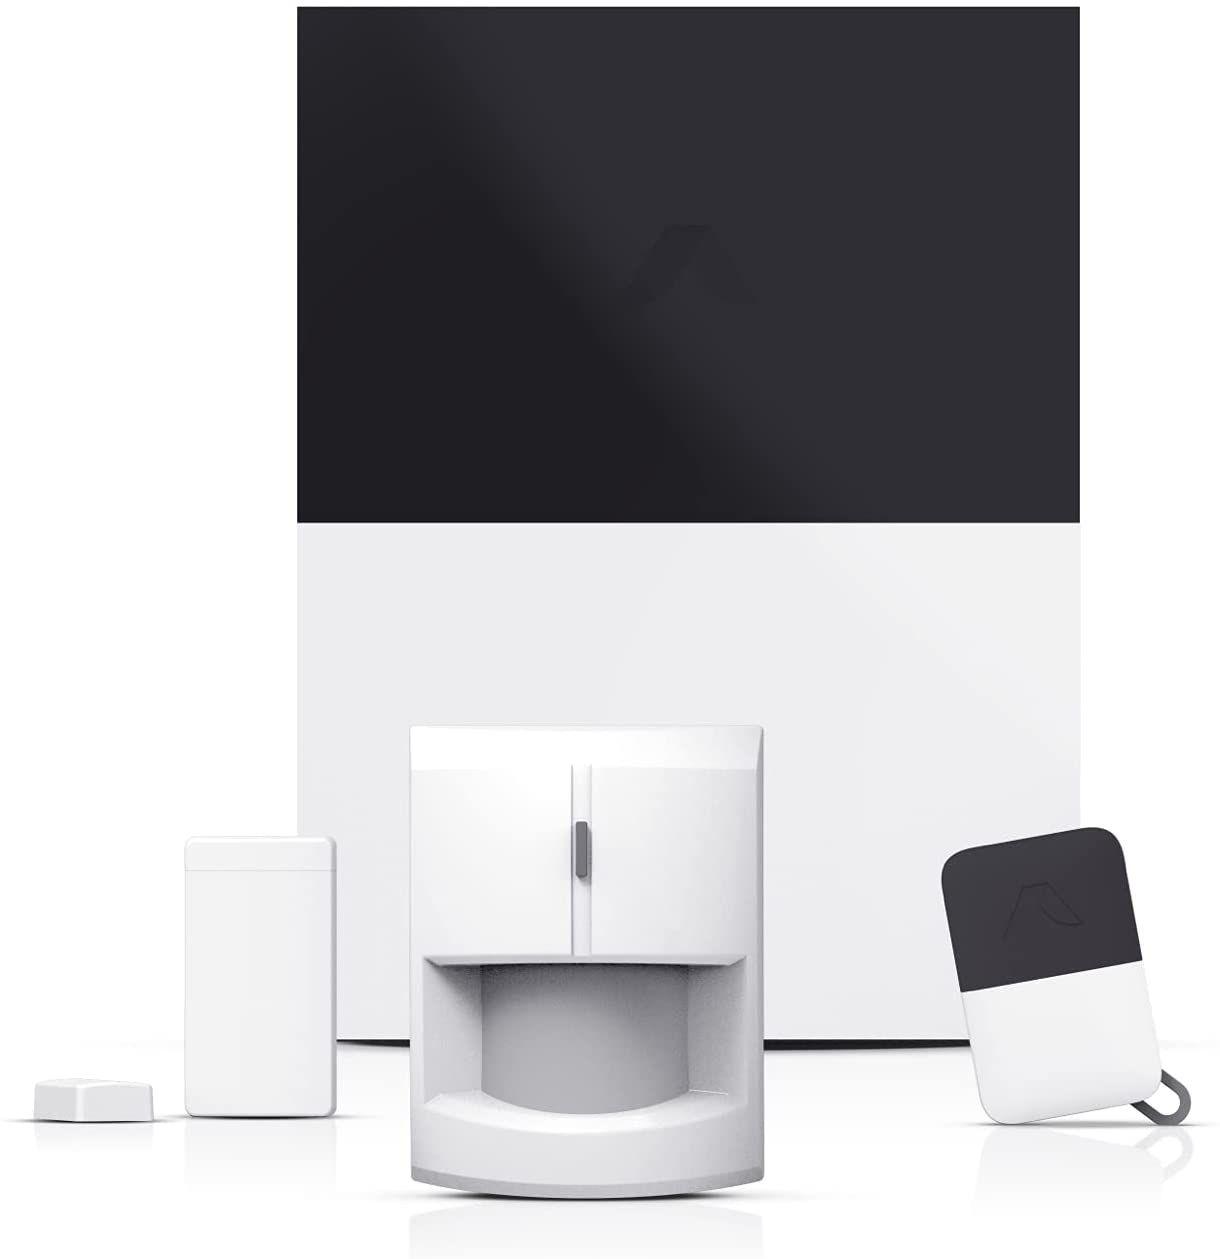 abode Essentials Starter Kit DIY Wireless Home Security System